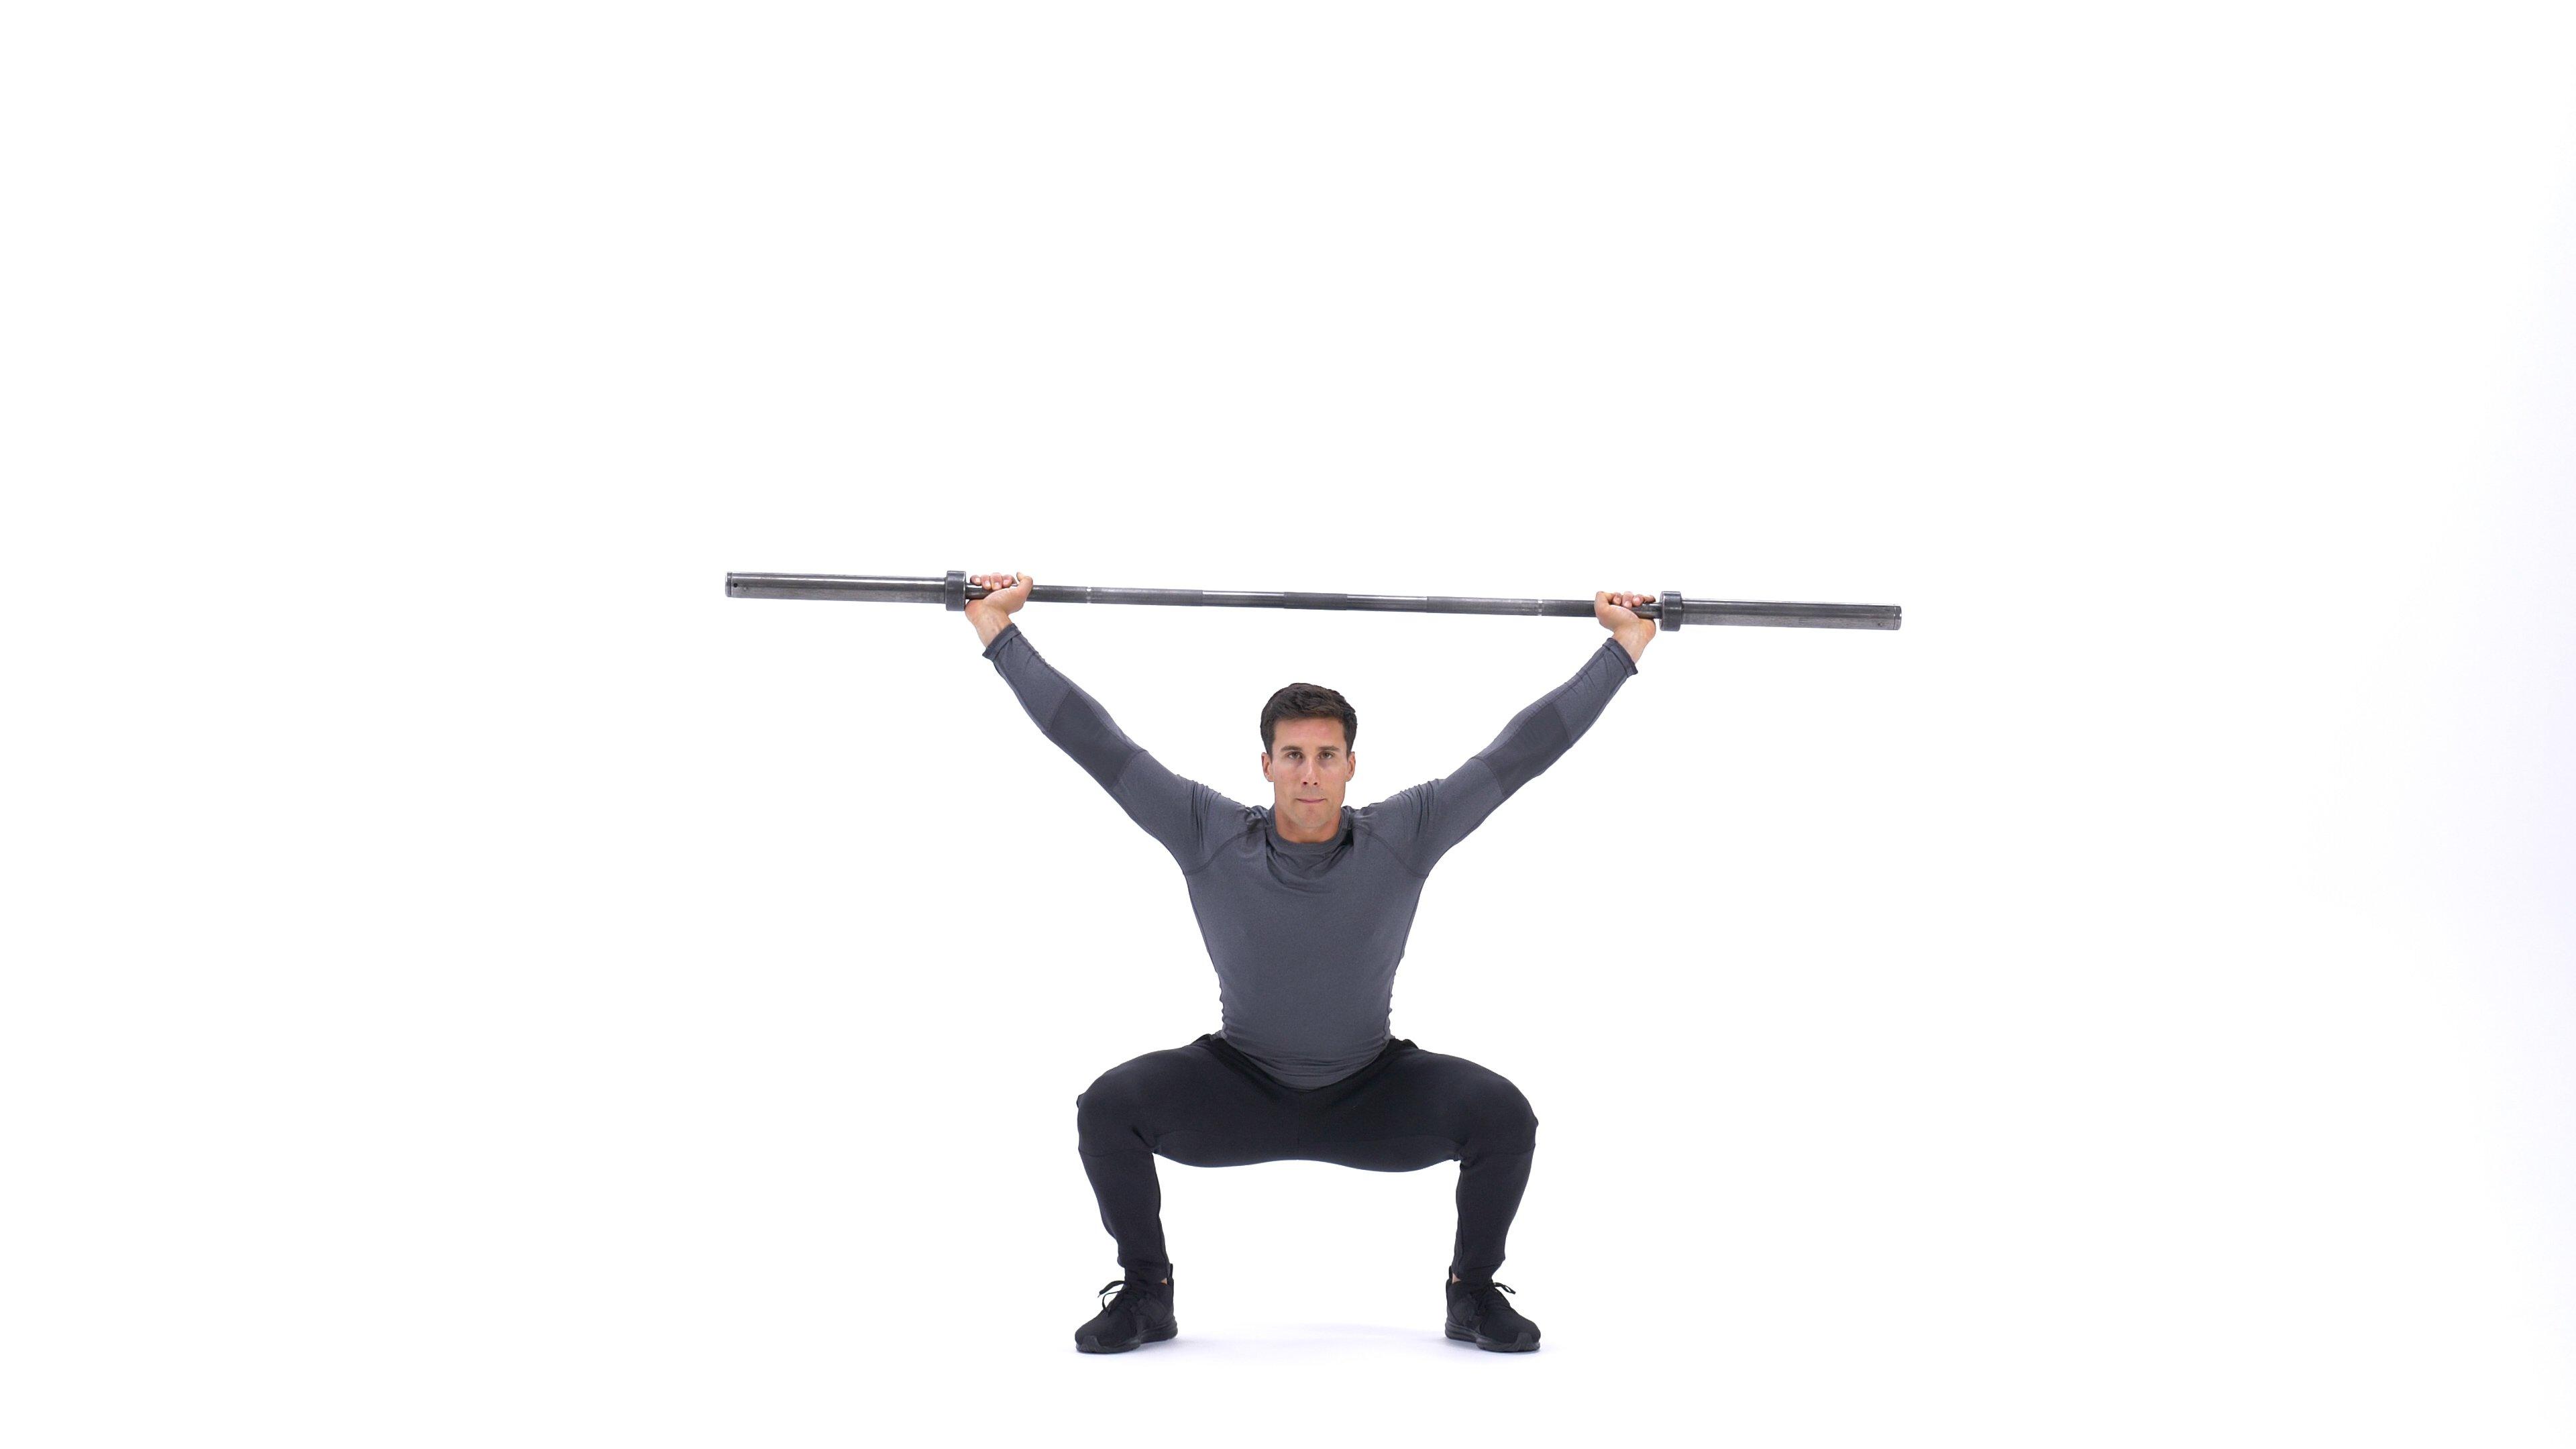 Overhead squat image